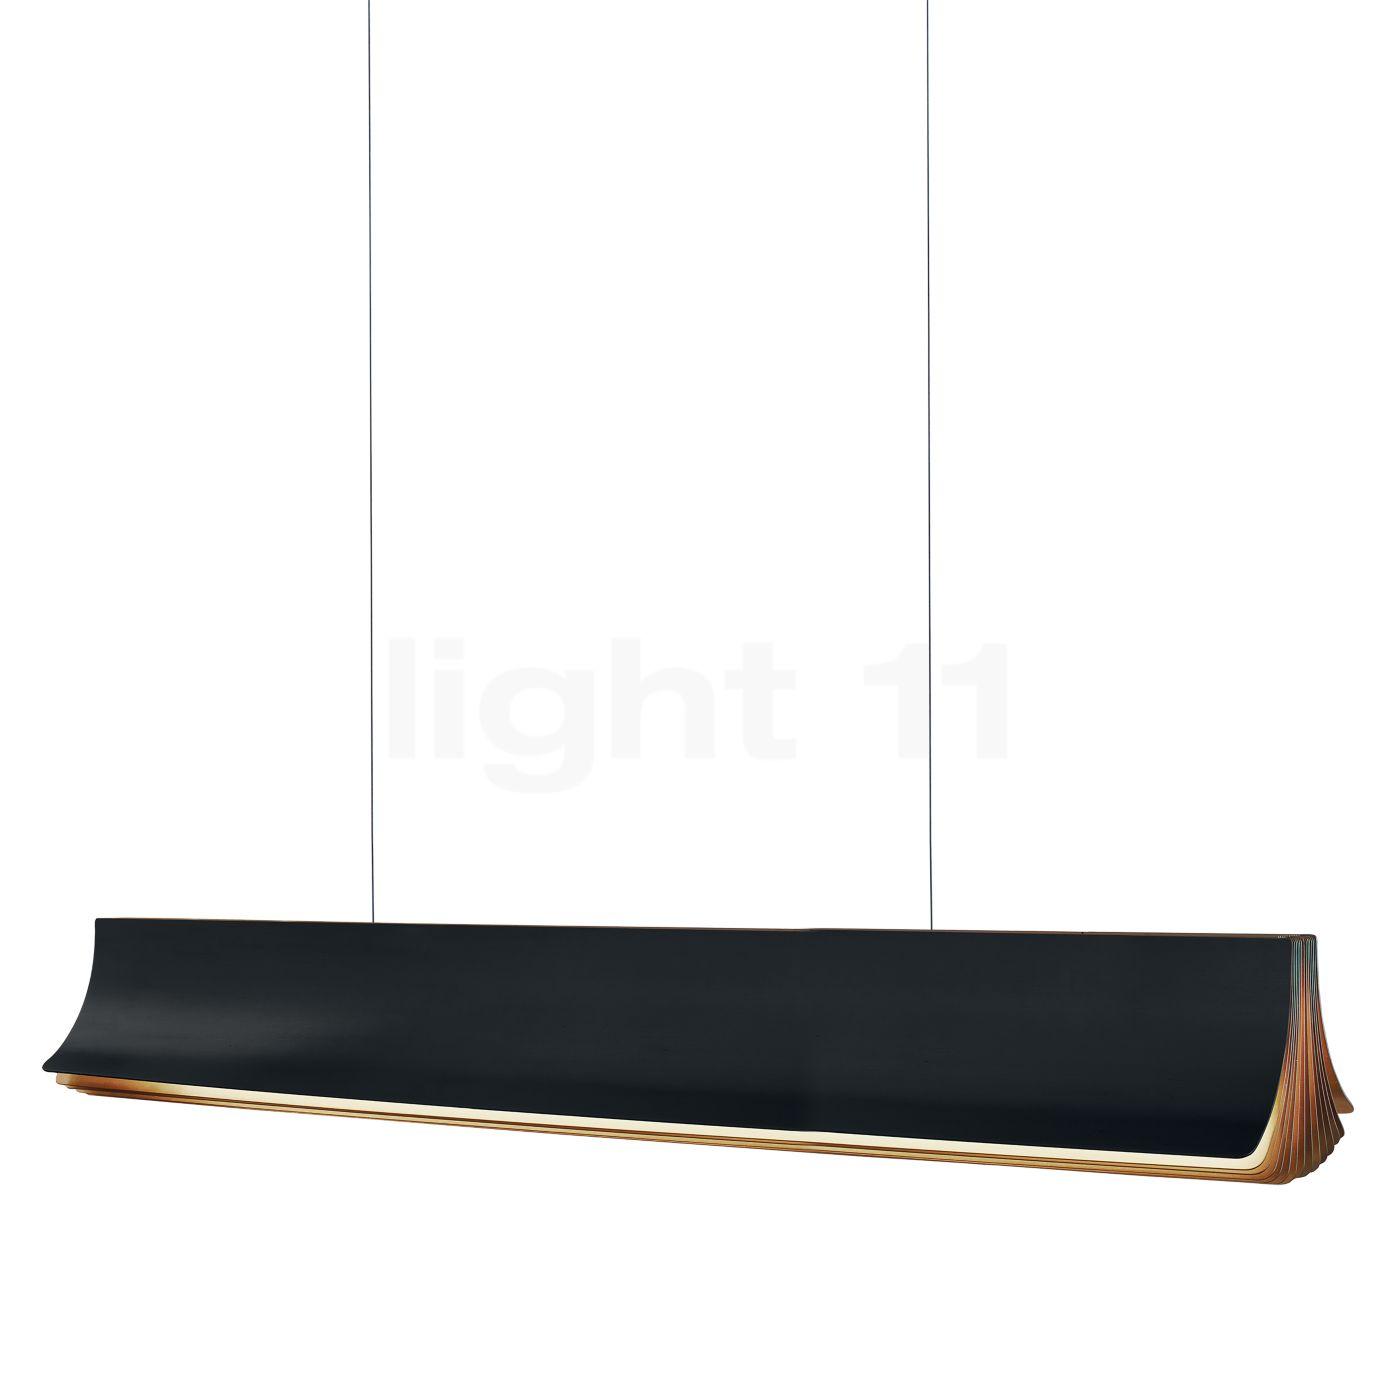 DCW Respiro Pendelleuchte LED, schwarz, 120 cm RESPIRO 1200 BL-GOLD